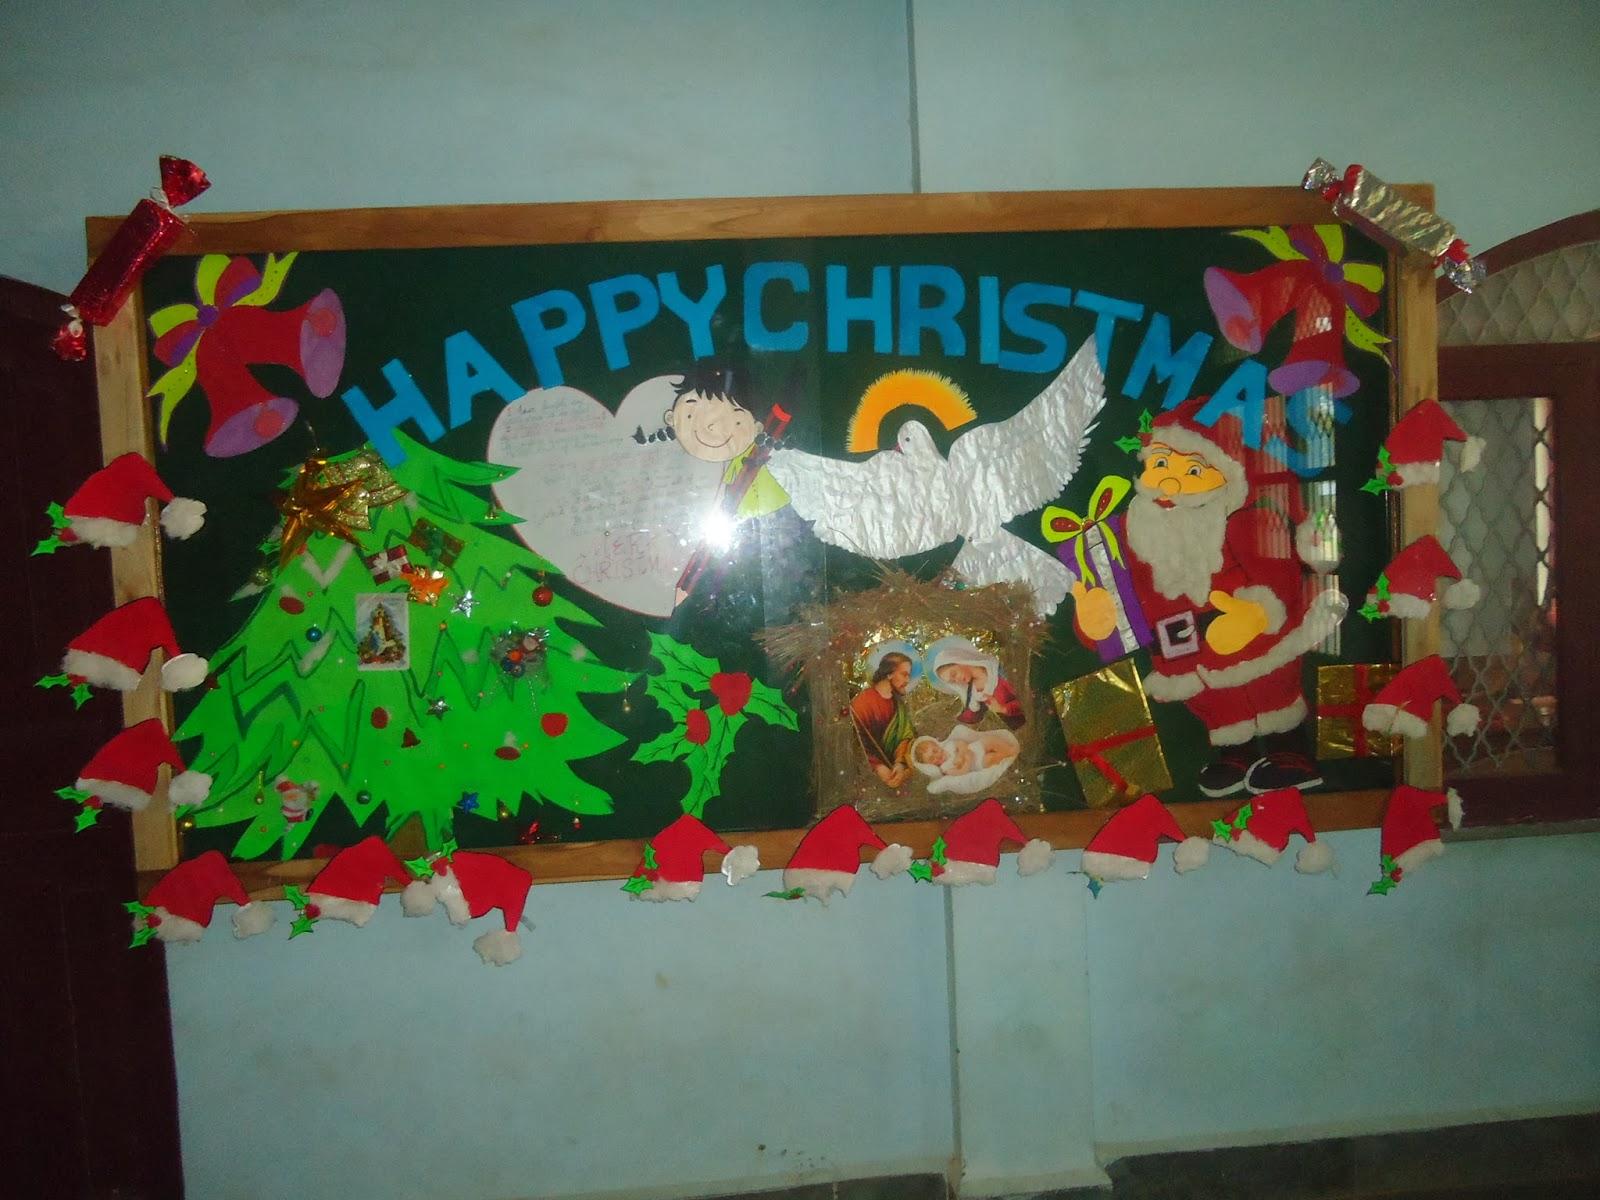 Christ convent school bulletin board decorations for Decoration board